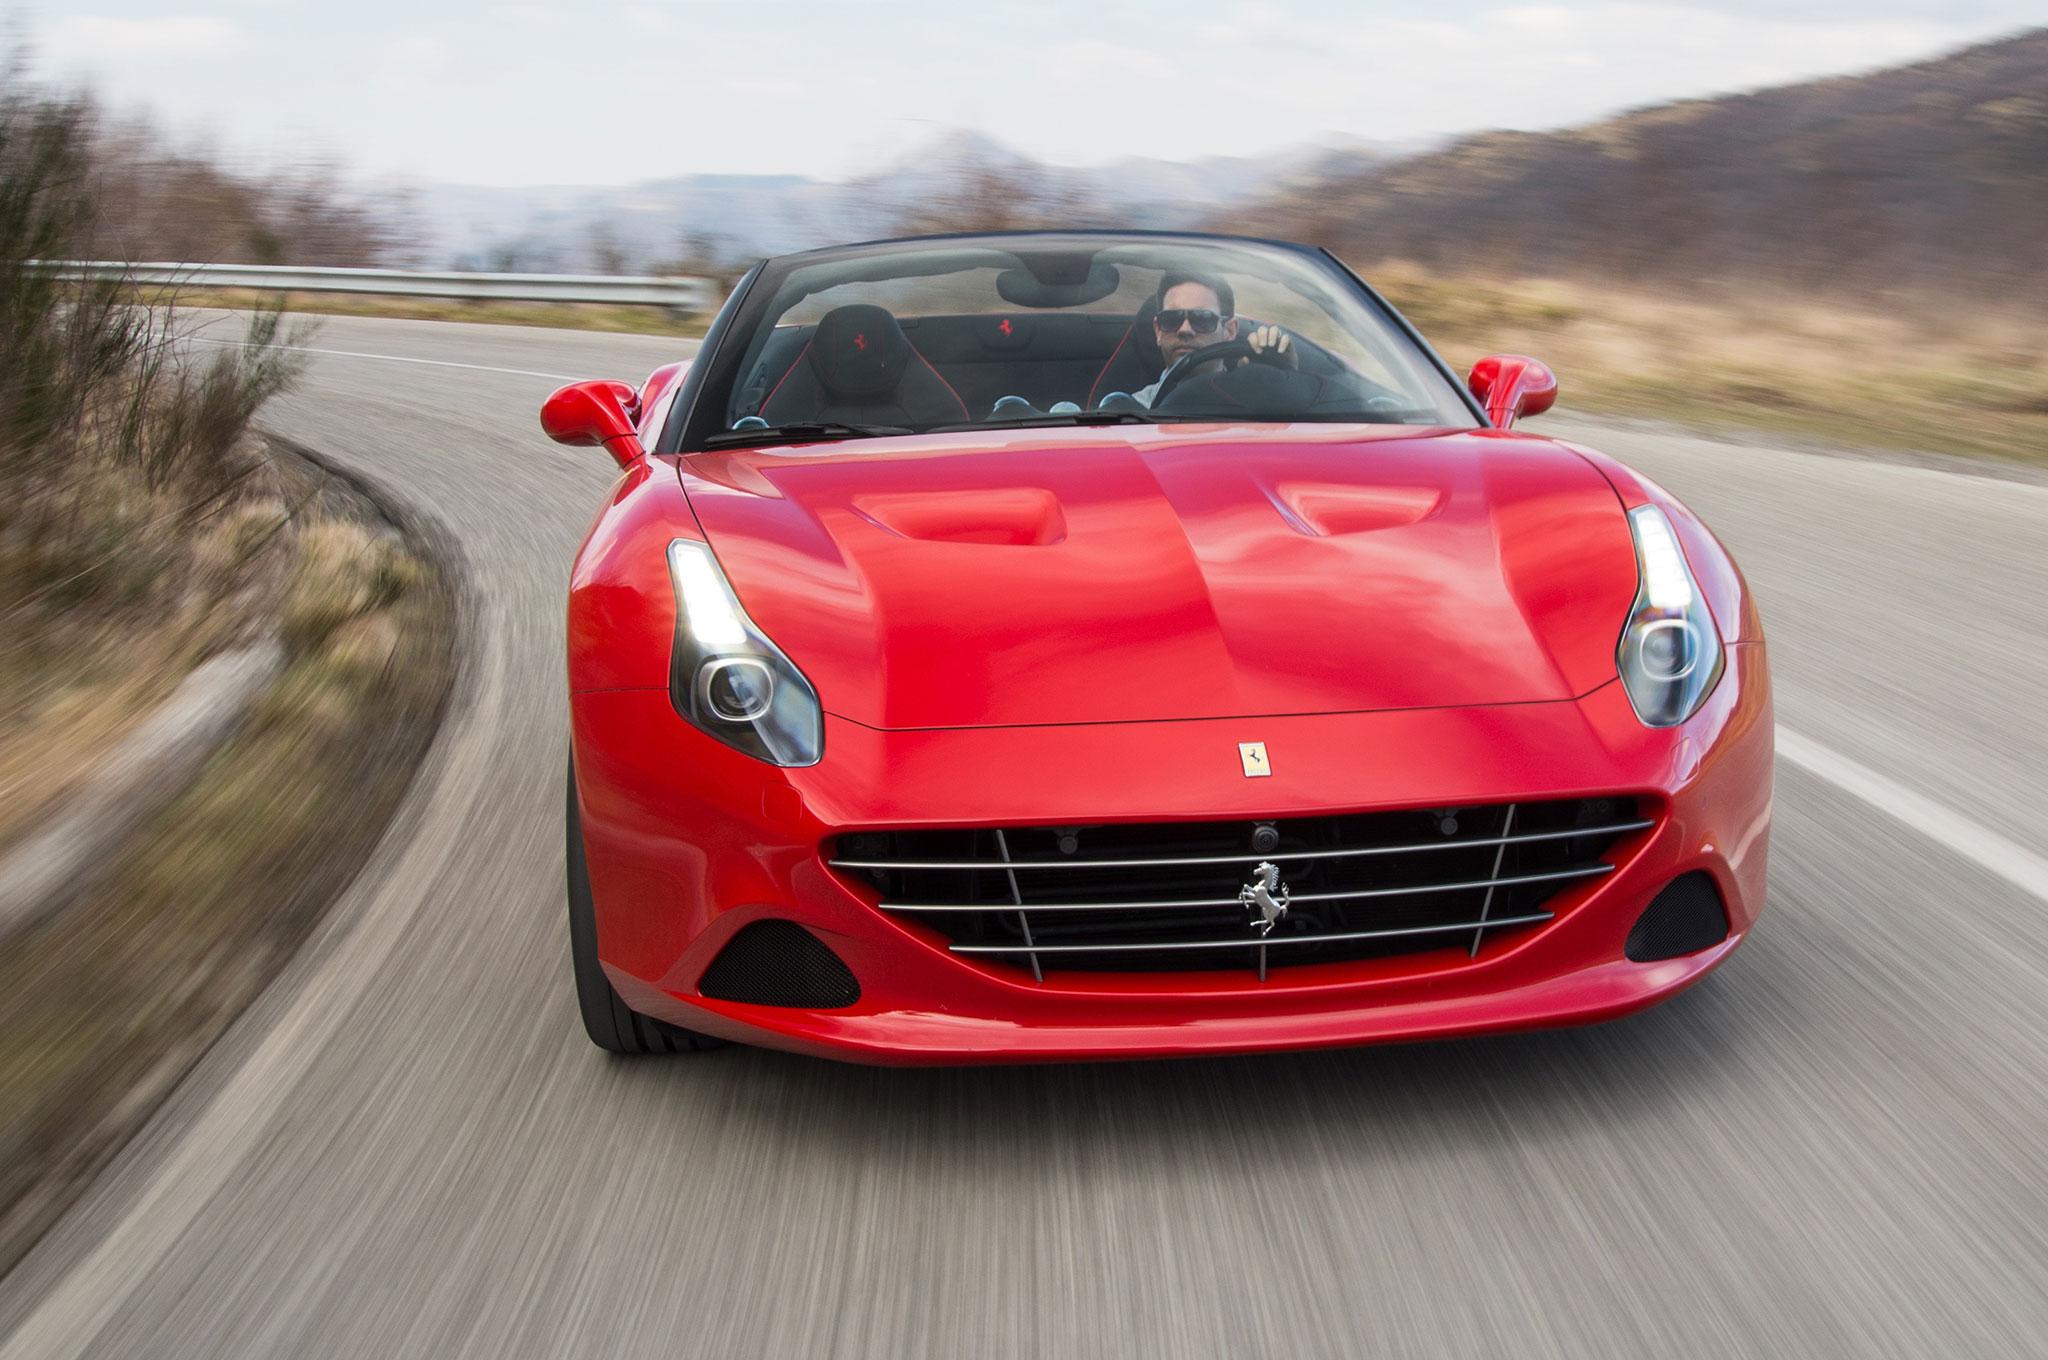 ferrari 3 wheel car by 2016 ferrari california t handling speciale review